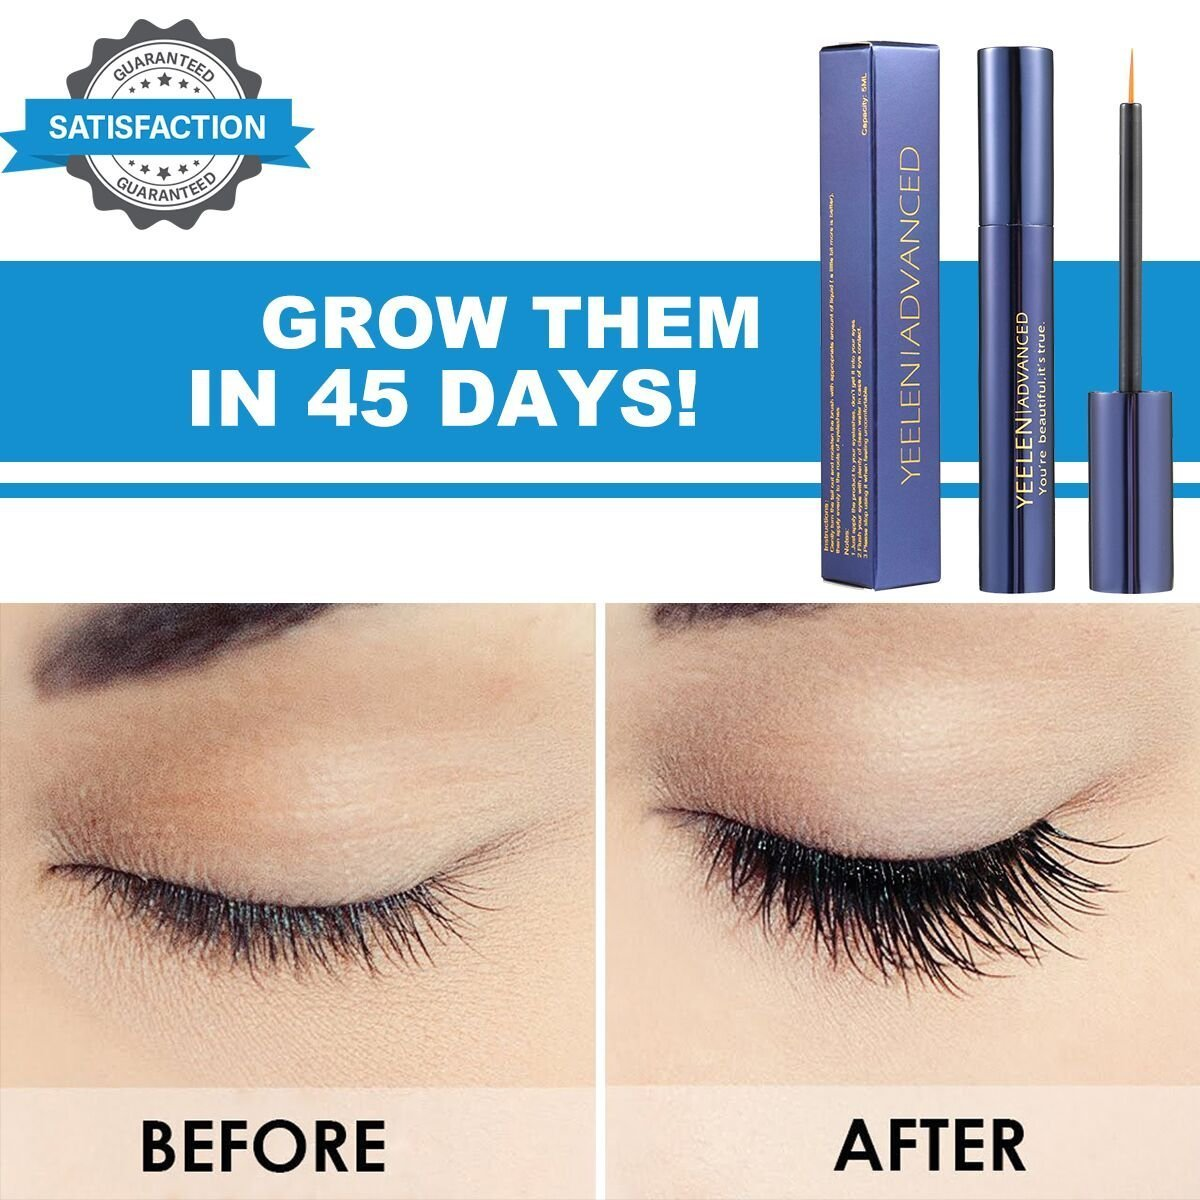 Yeelen Eyelash Eyebrow Growth Serum Grows Longer, Fuller, Thicker Lashes & Brows in 45 days! Enhancer Eyelash Conditioner Non-prescription Eyelash Serum 5ml by Yeelen (Image #3)